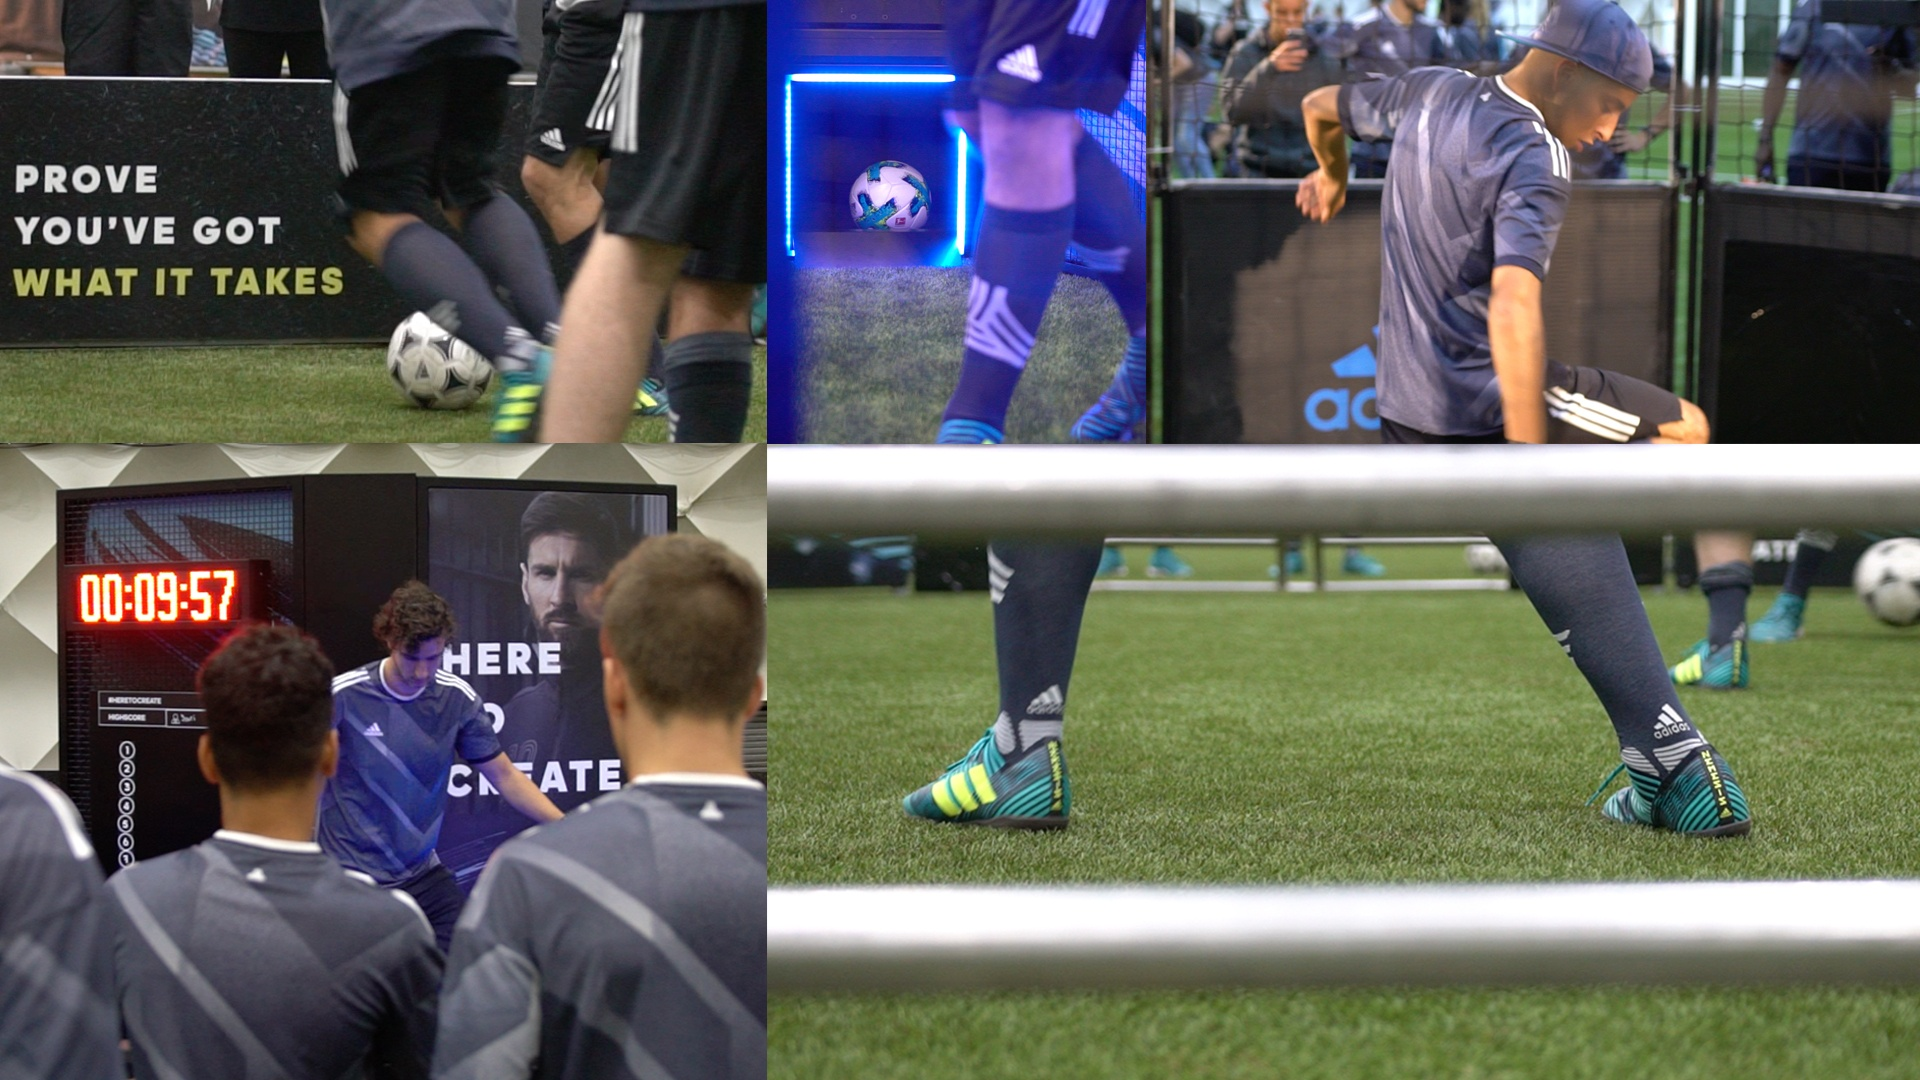 Thumbnail for adidas Nemeziz - it's not made for you